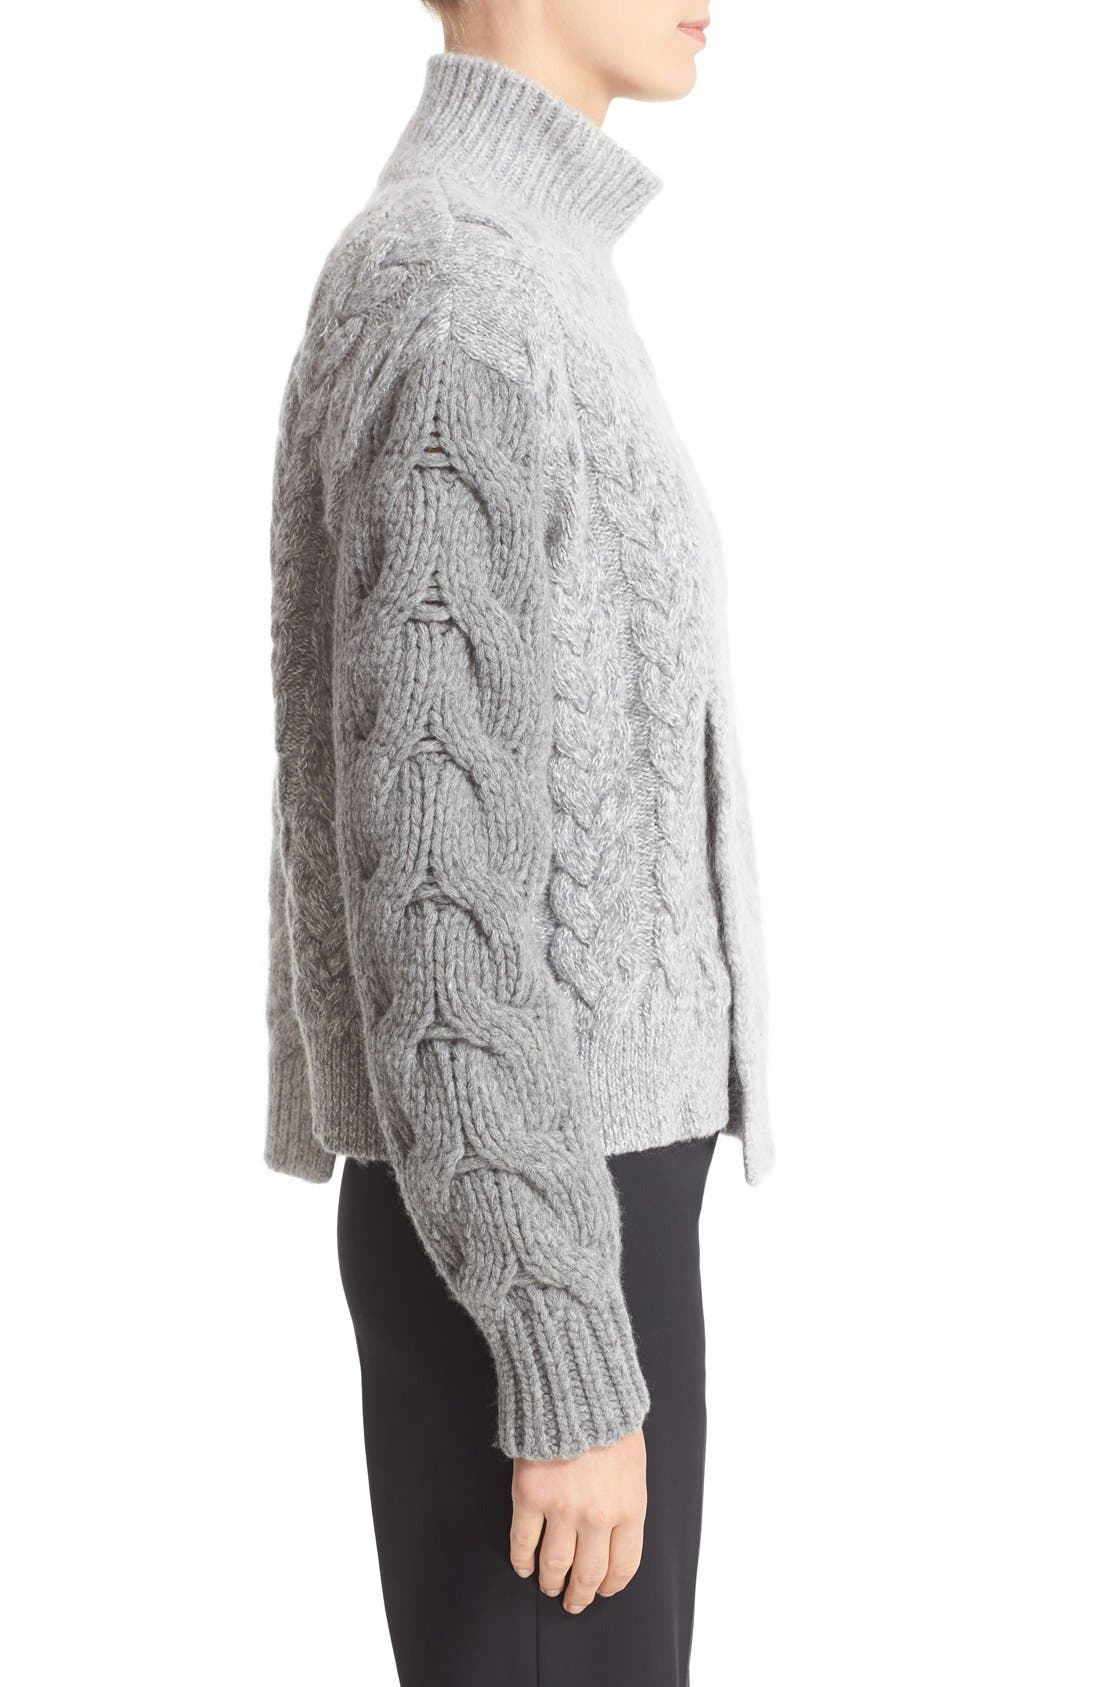 STELLA MCCARTNEY, Mixed Media Turtleneck Sweater, Alternate thumbnail 6, color, 120